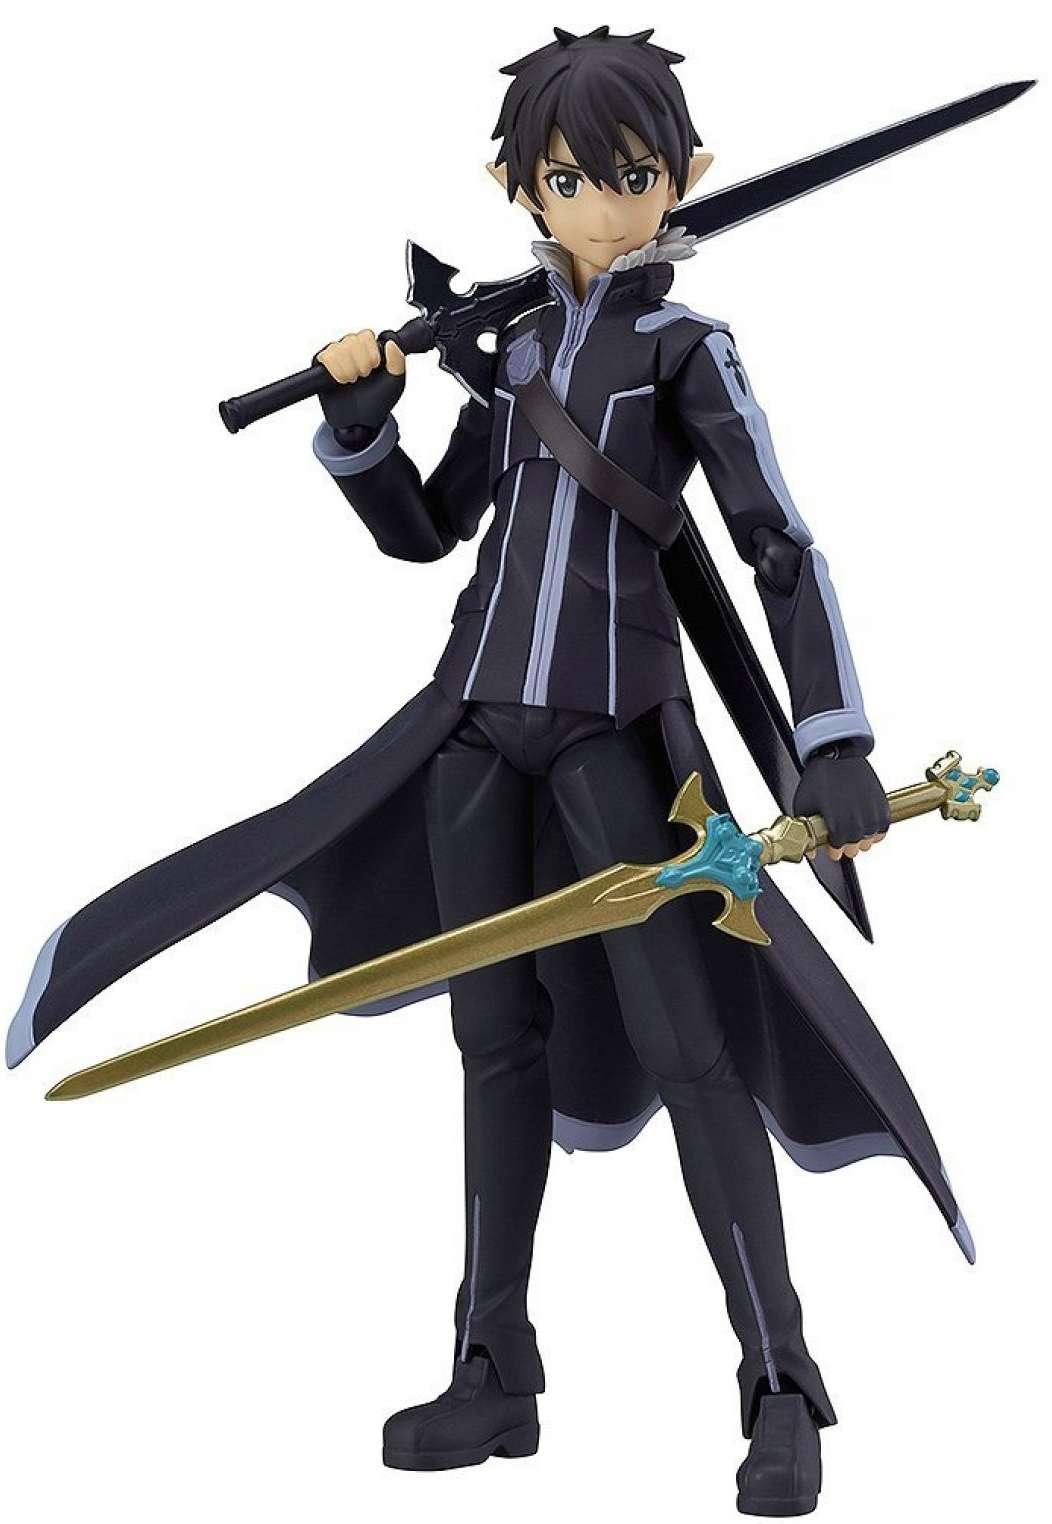 kirito-alo-ver-sword-art-online-figma-body